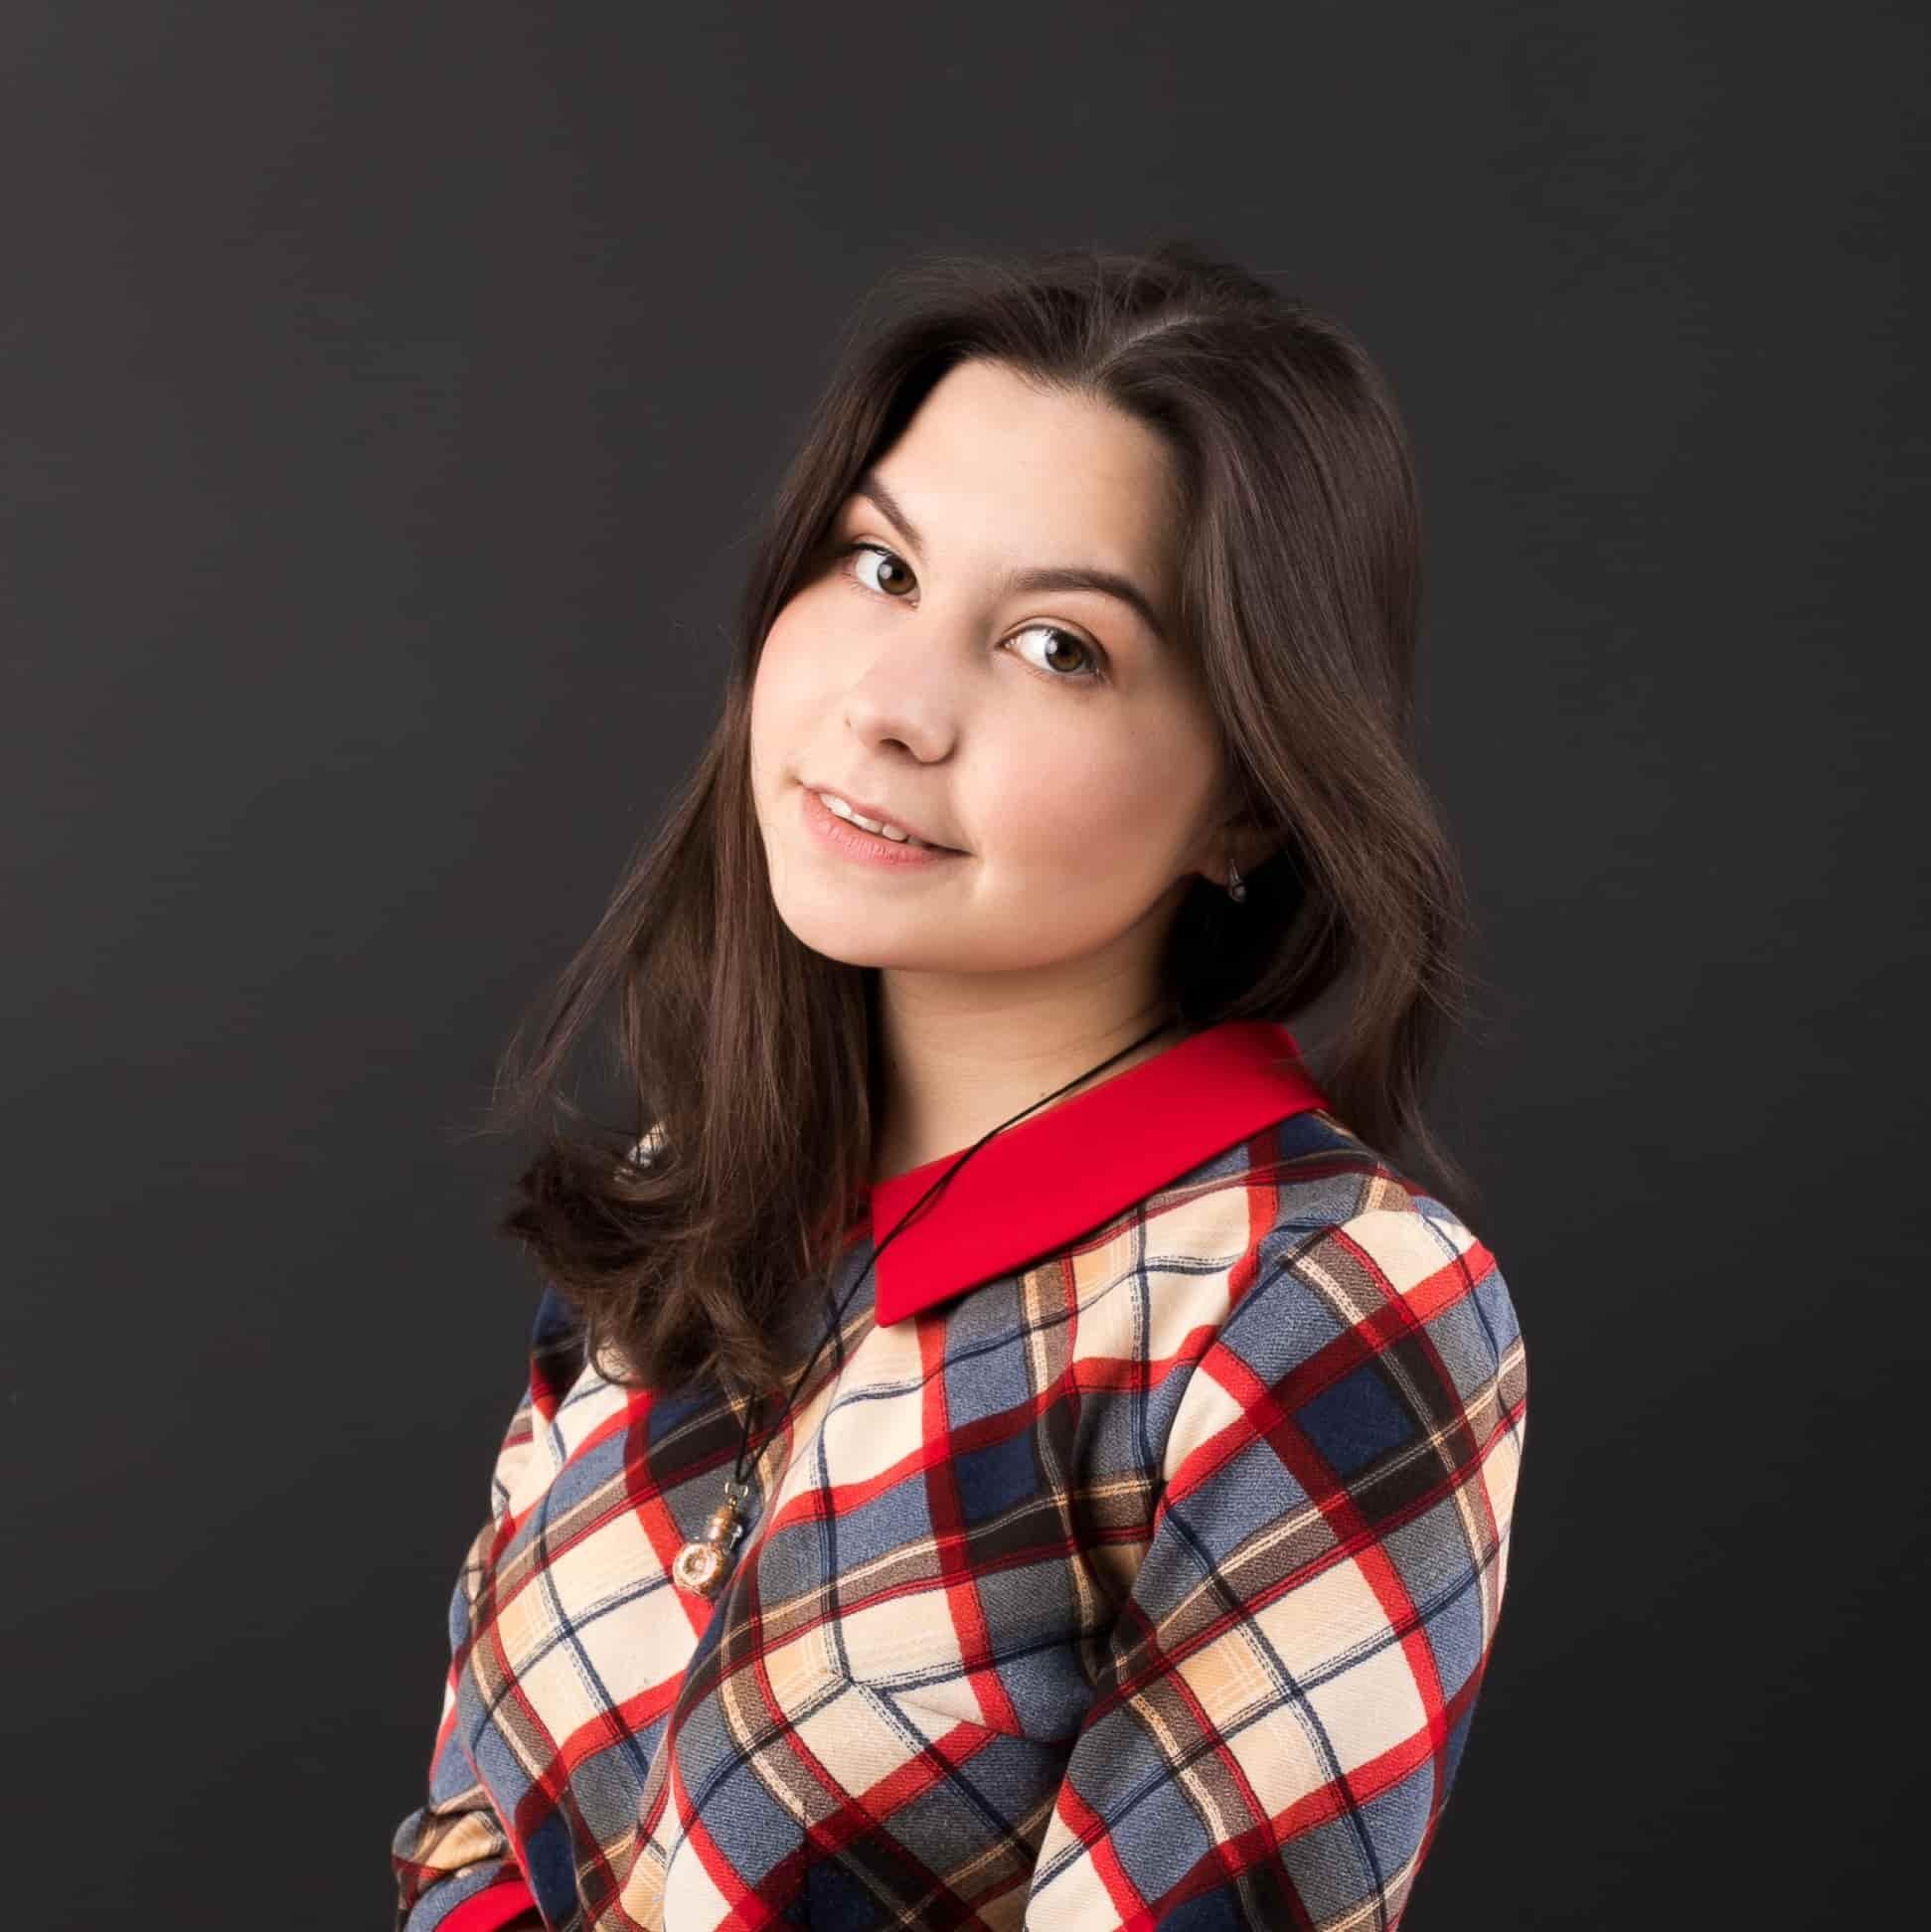 Фархутдинова Дилара - Ведущий GIS-специалист